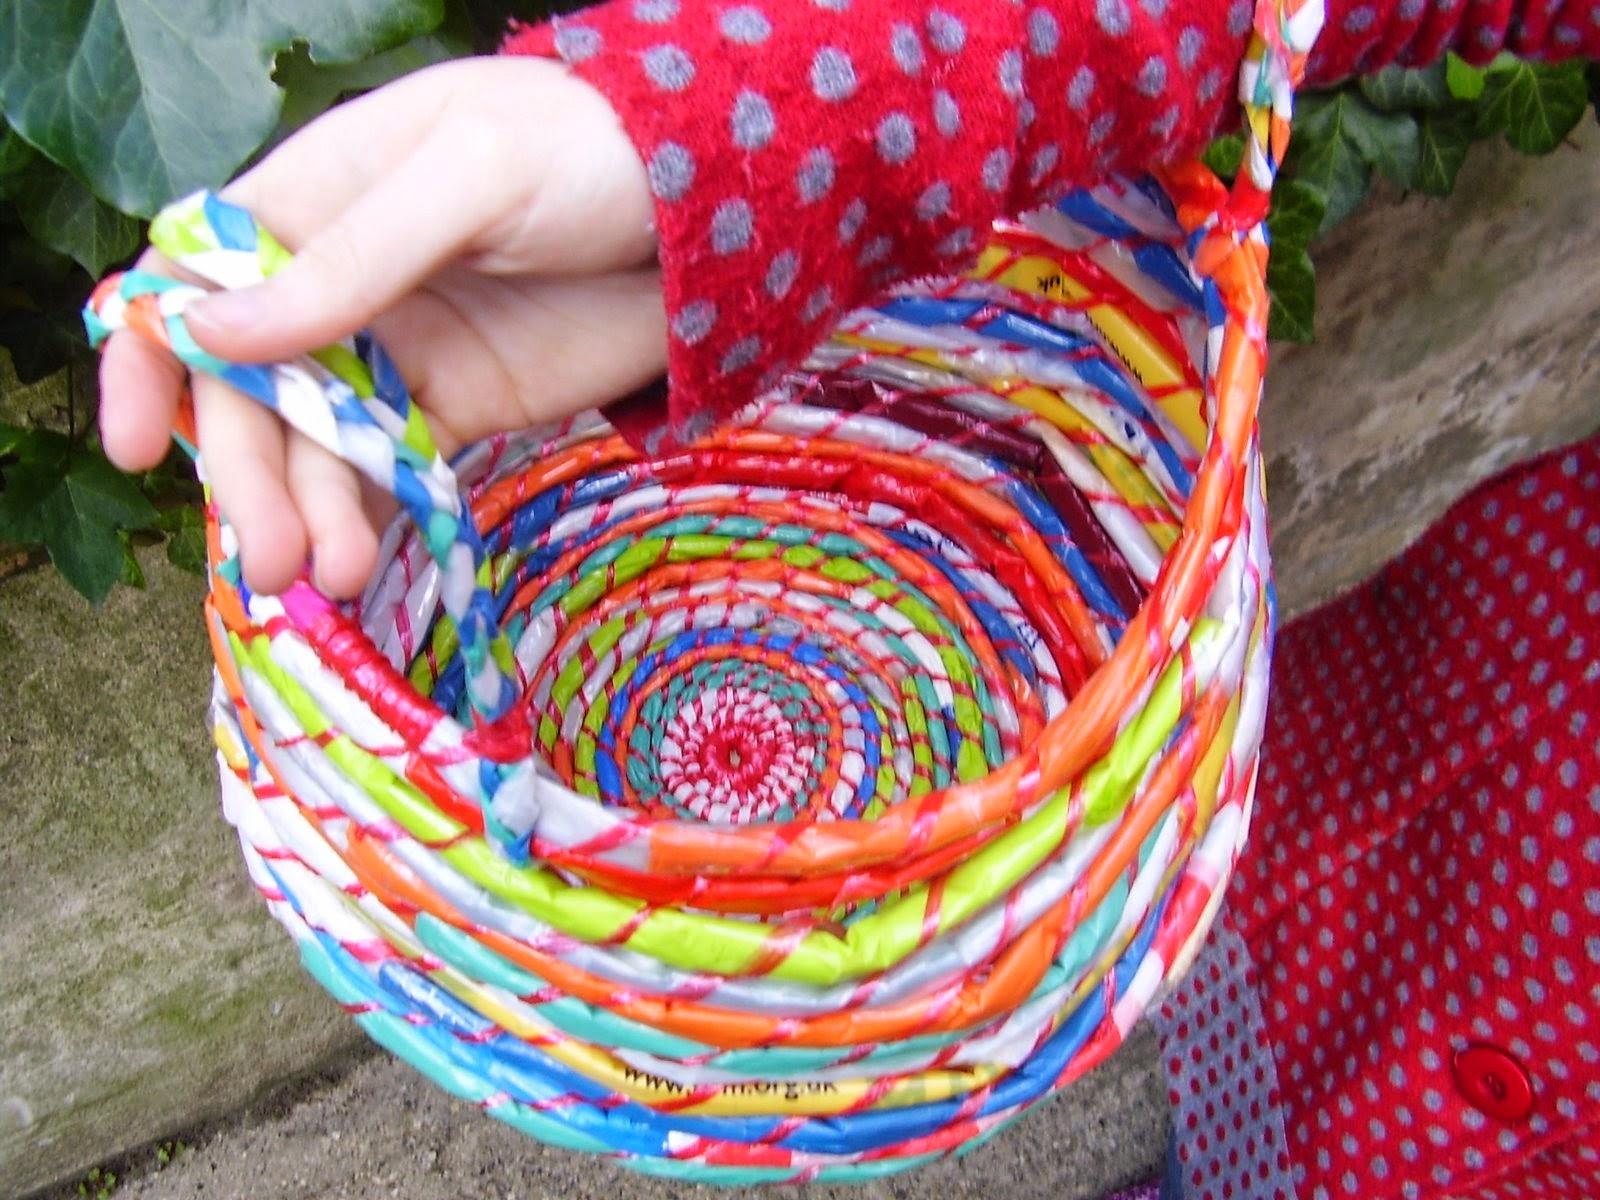 12 Cara Membuat Kreasi Kerajinan dari kantong plastik.  8852078ecd